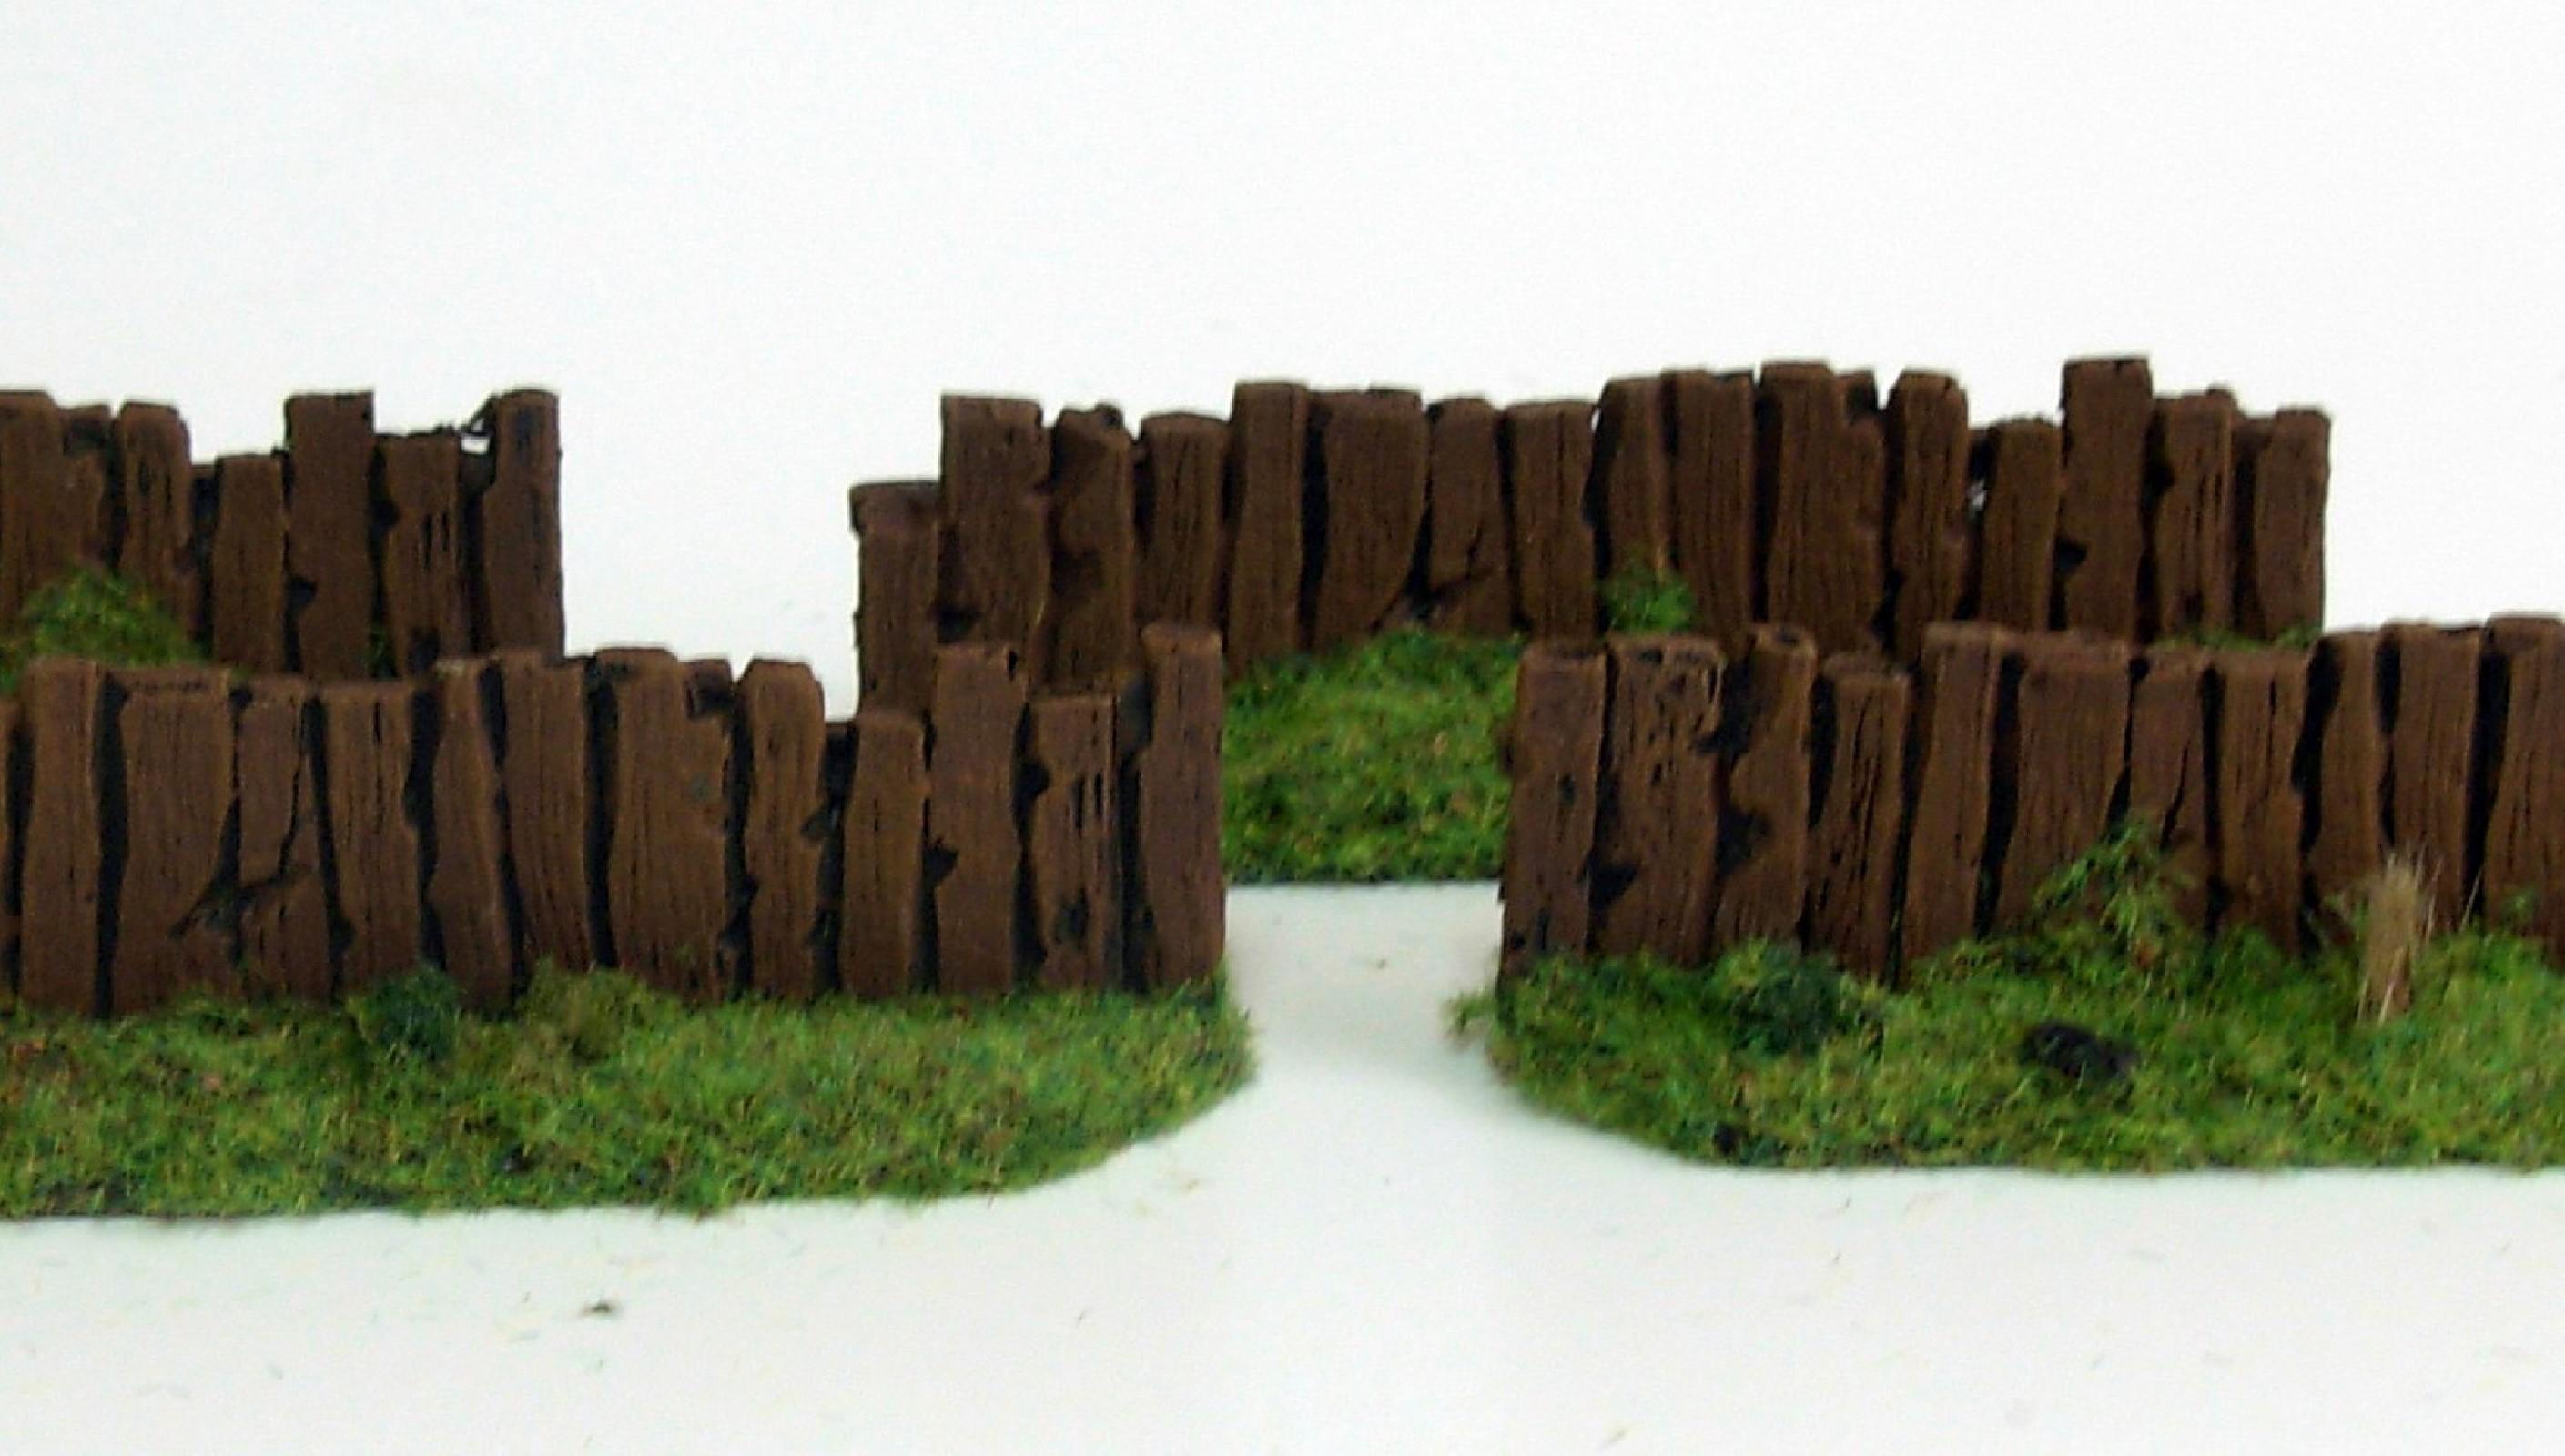 Wooden Fences I